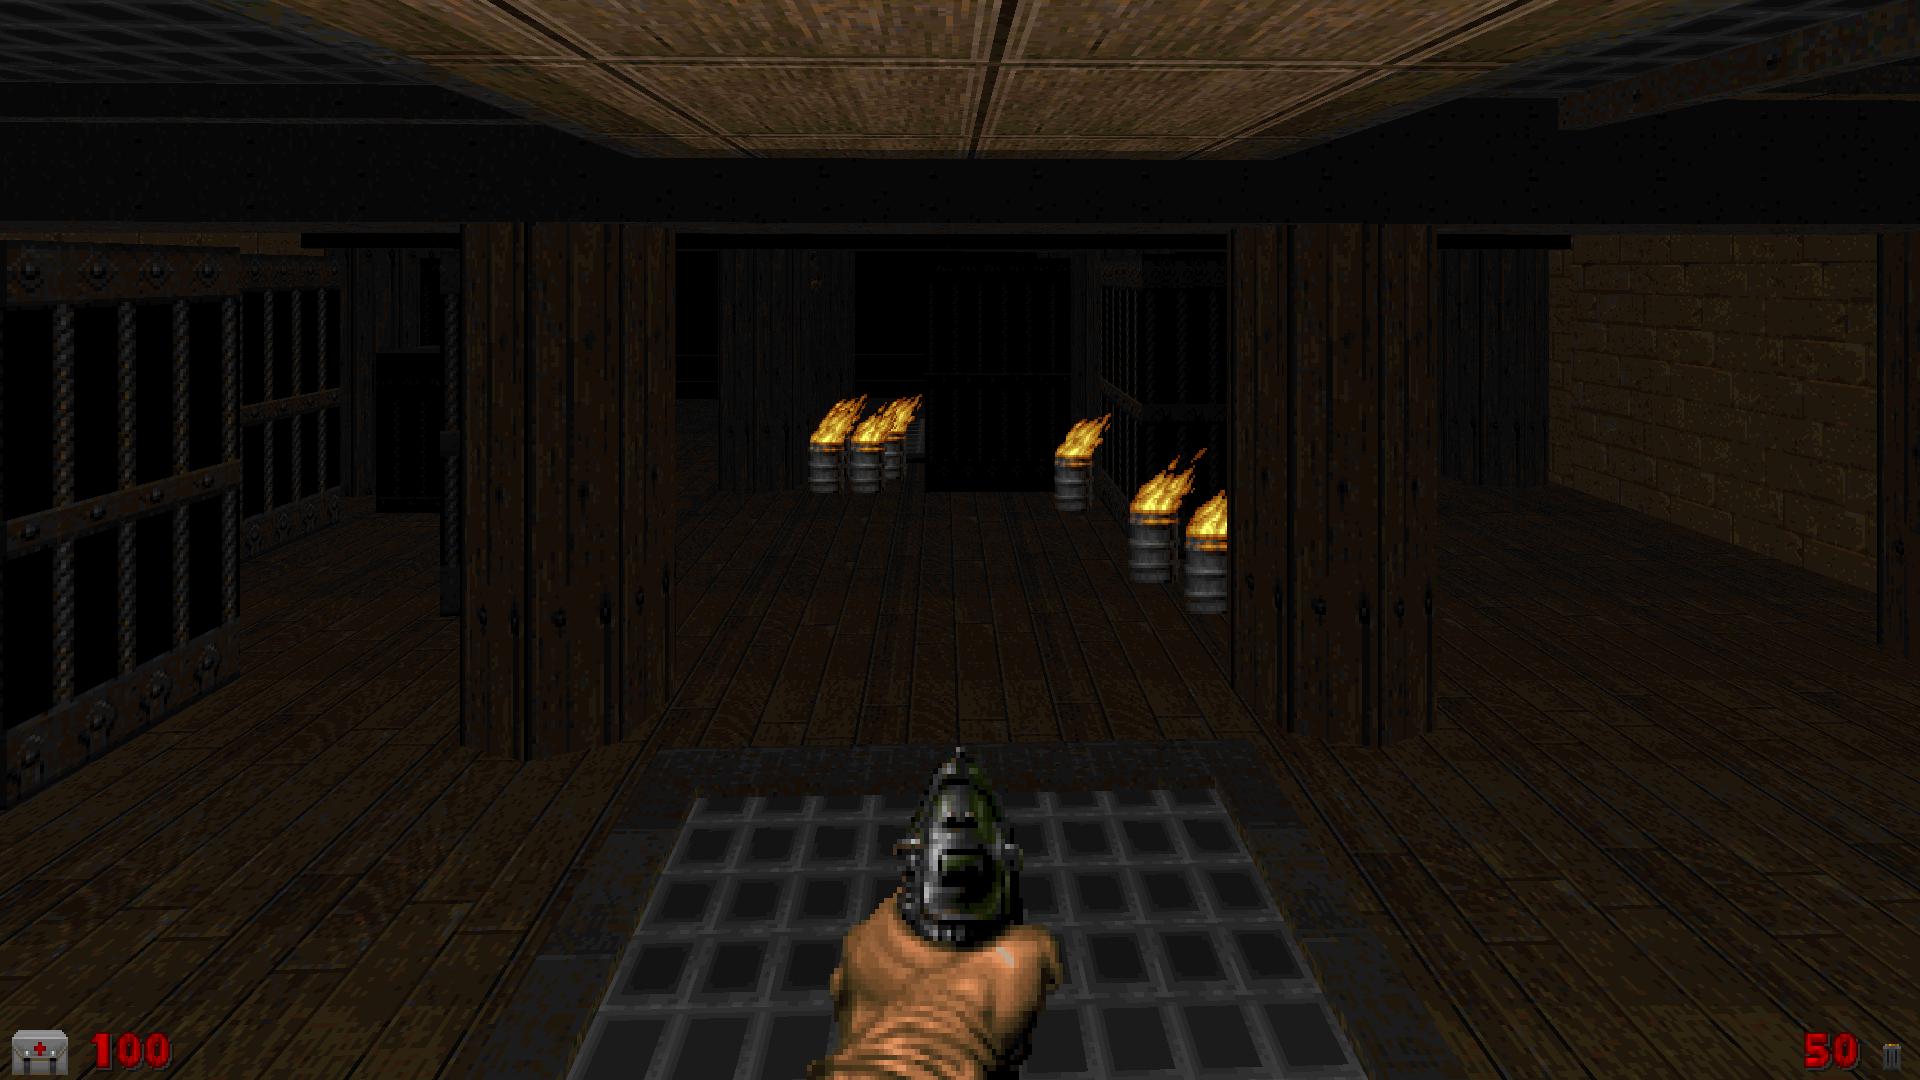 Screenshot_Doom_20200330_190044.png.6de7cc9f70db67f1a601d548d1b14df5.png